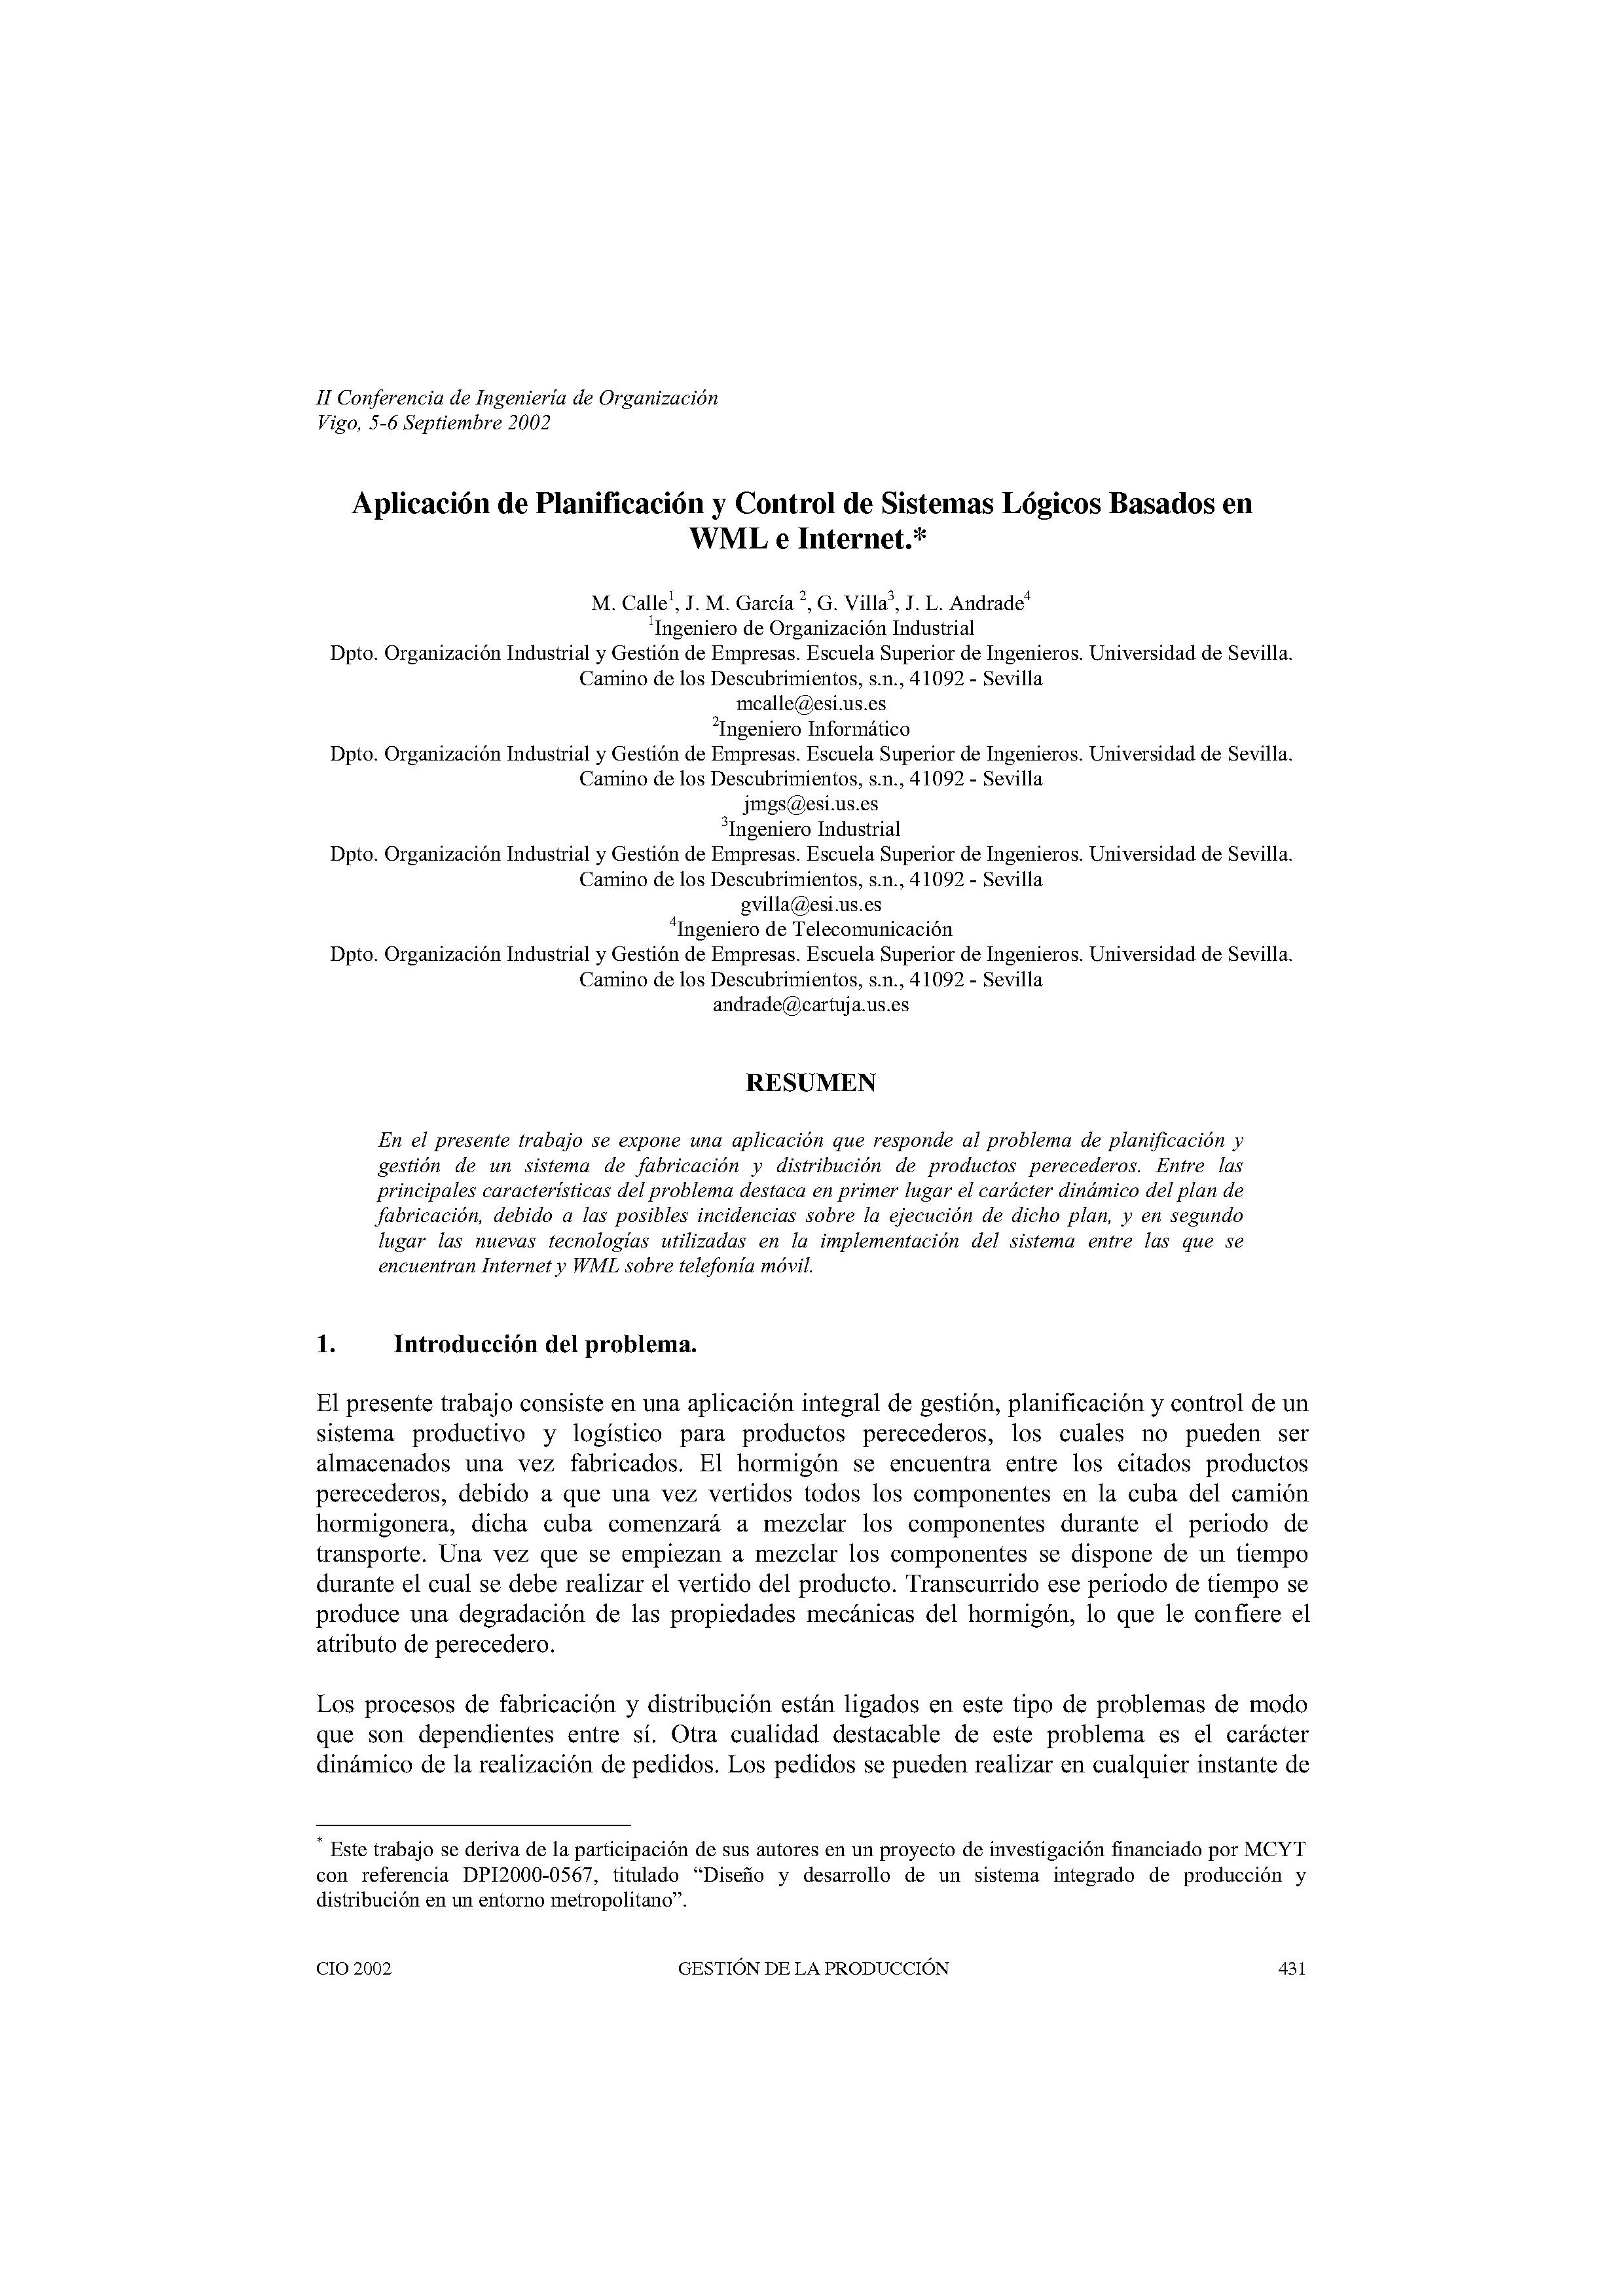 Aplicación de Planificación y Control de Sistemas Lógicos Basados en  WML e Internet.*